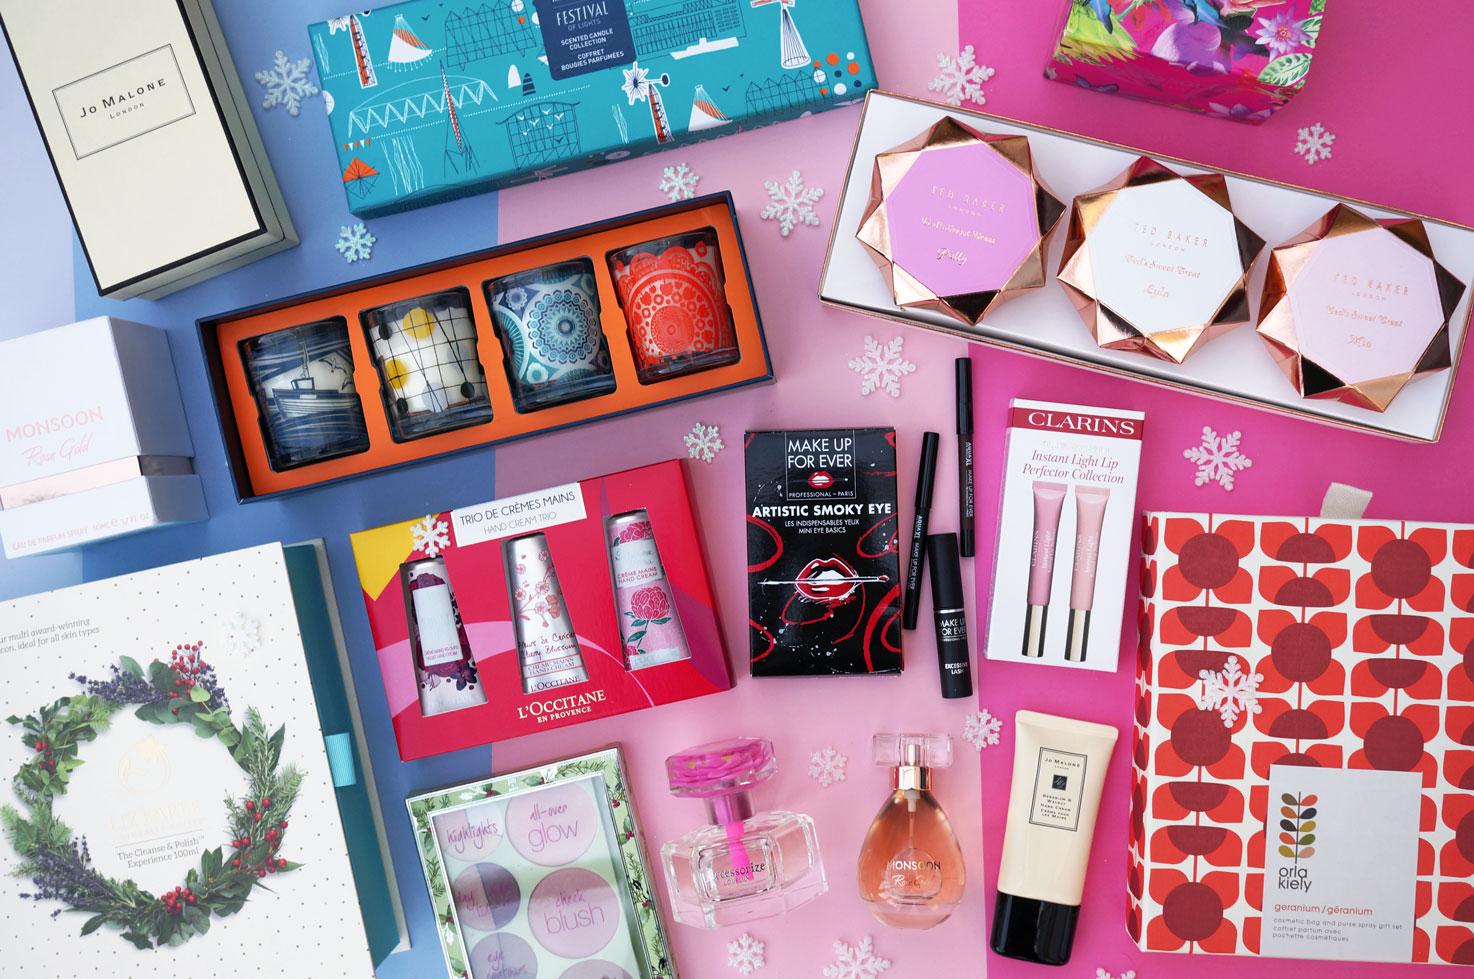 Budget Beauty Gift Guide Thou Shalt Not Covet